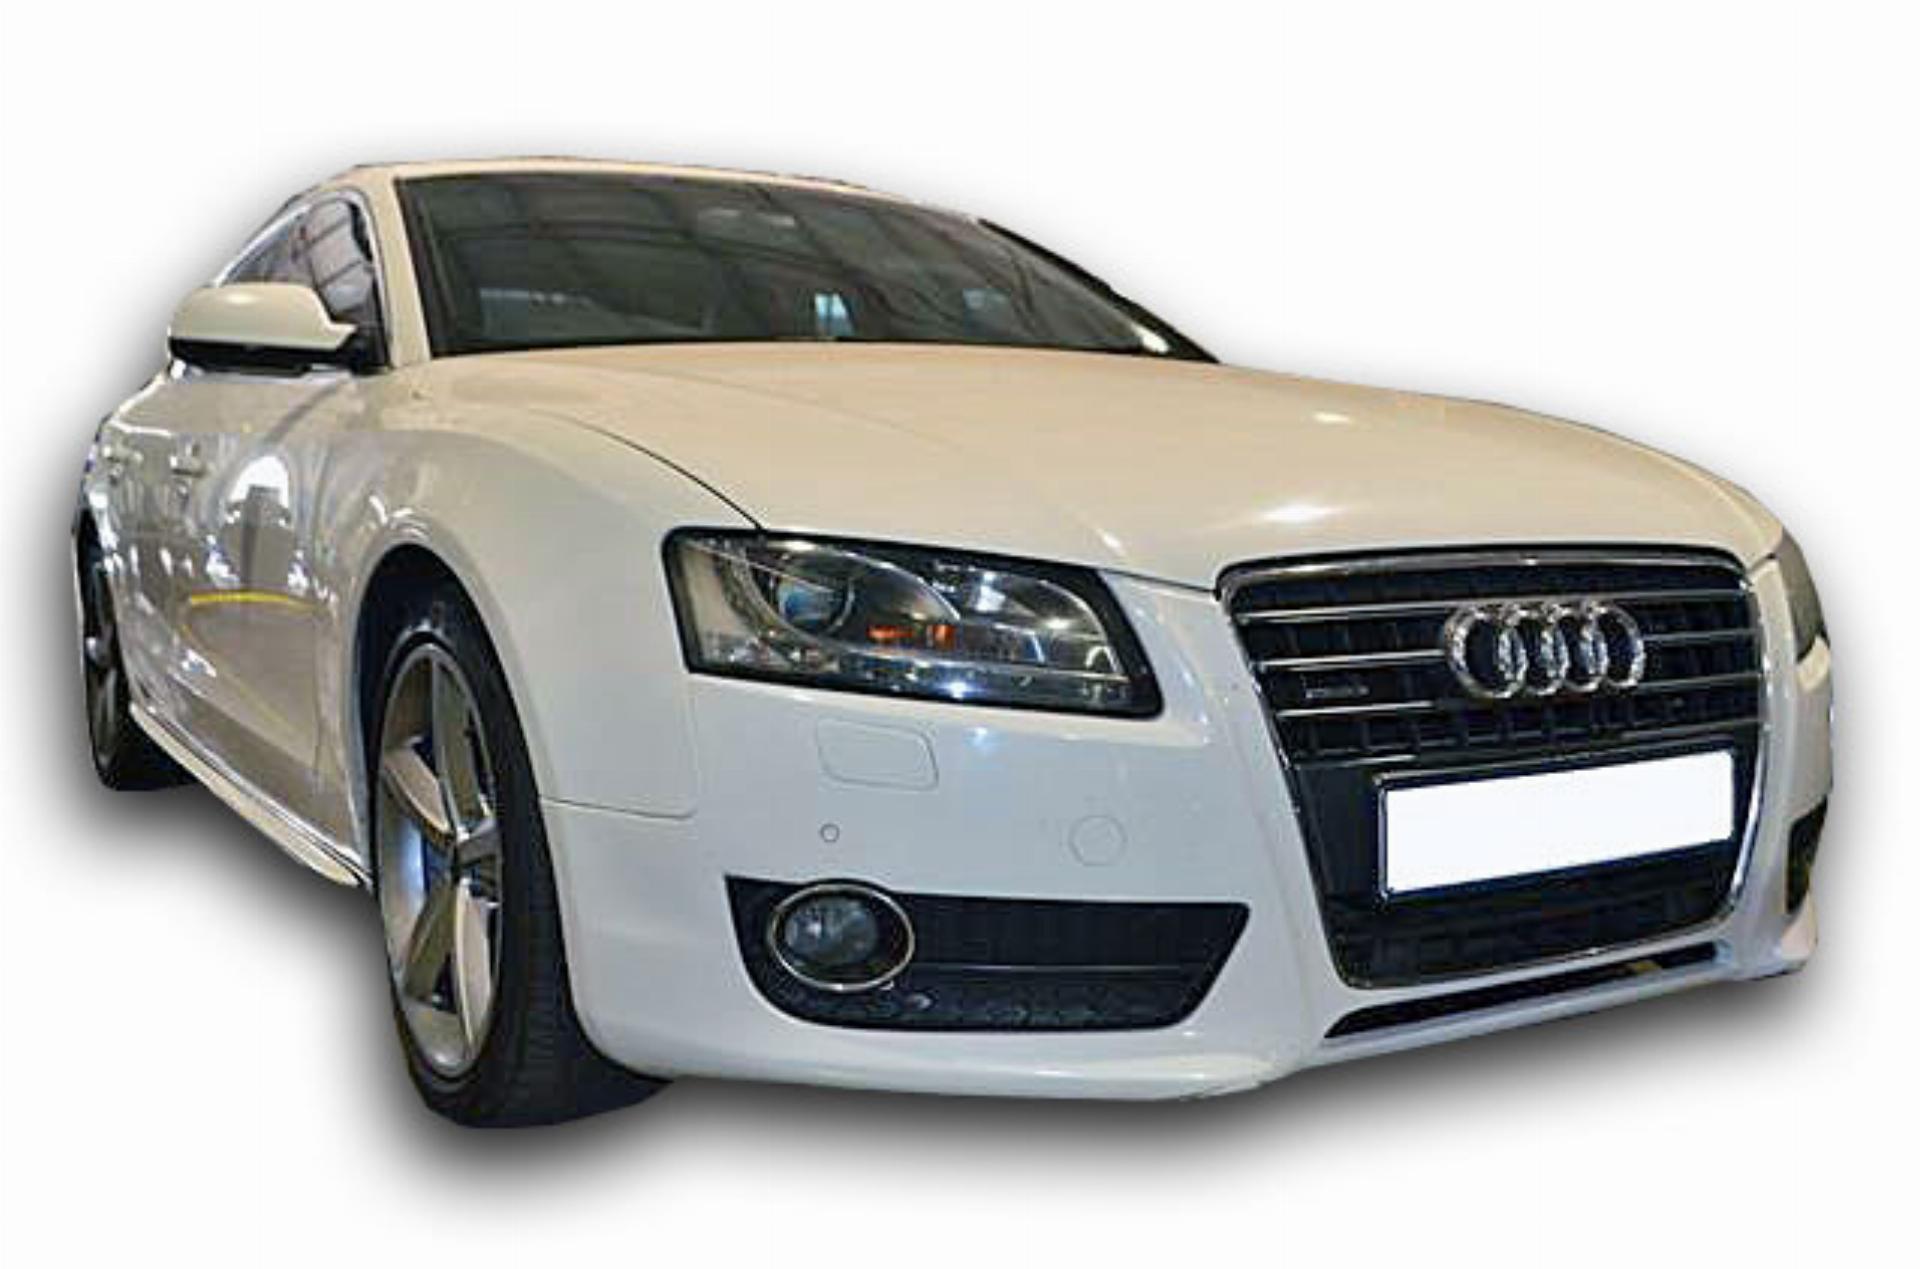 Audi A5 2.0T Fsi Q Stronic